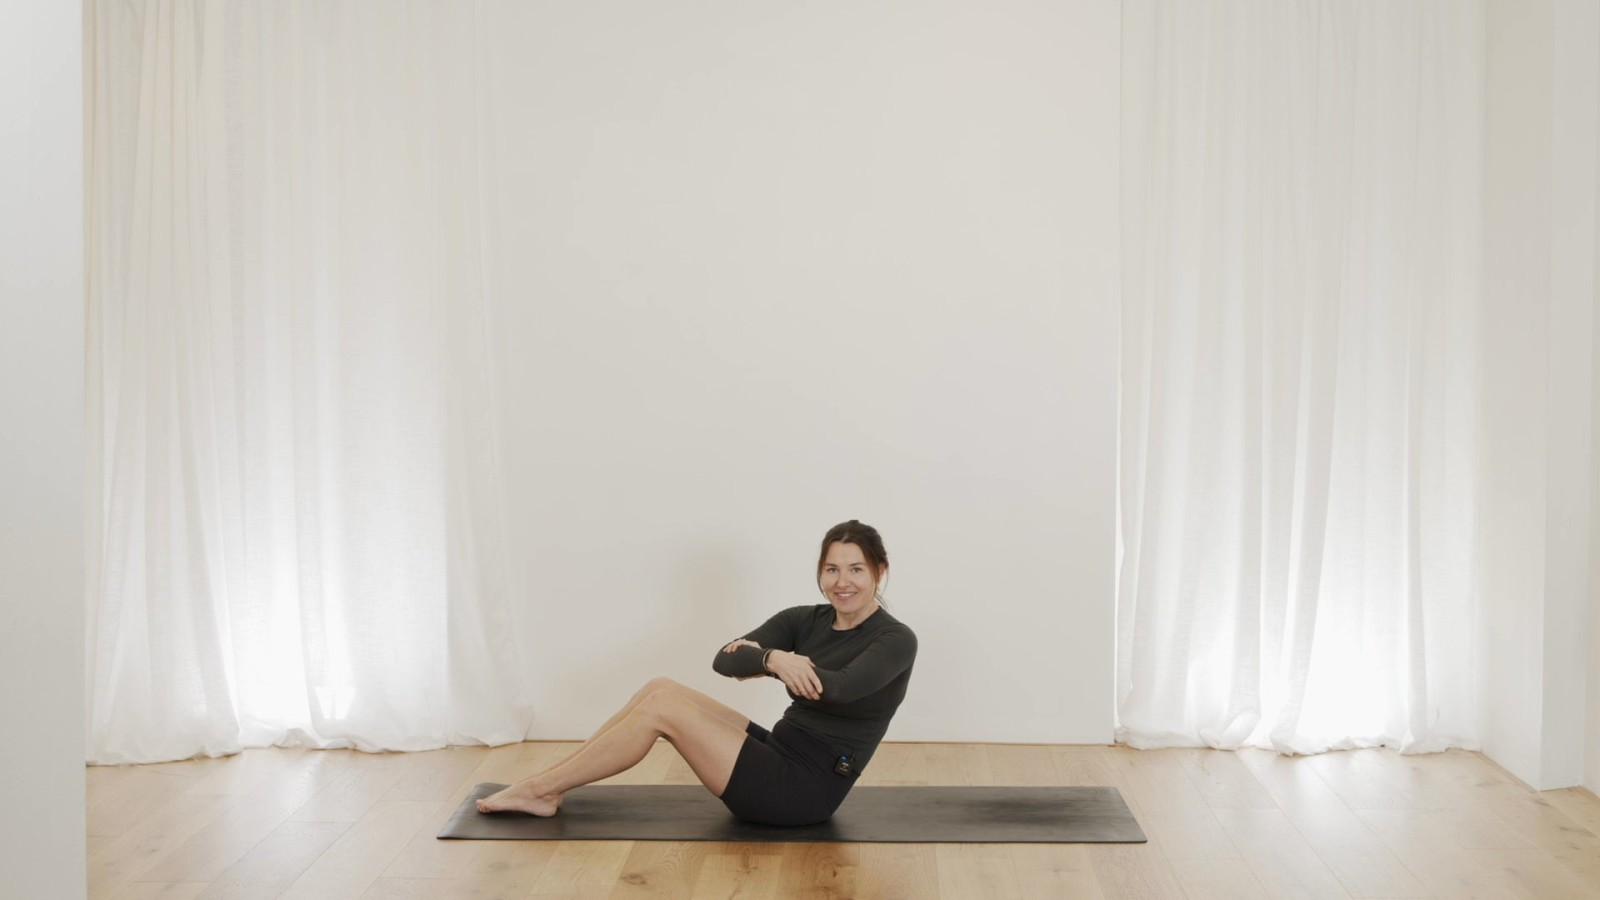 Total Core & Arms Pilates Workout with Aneta Bachanova